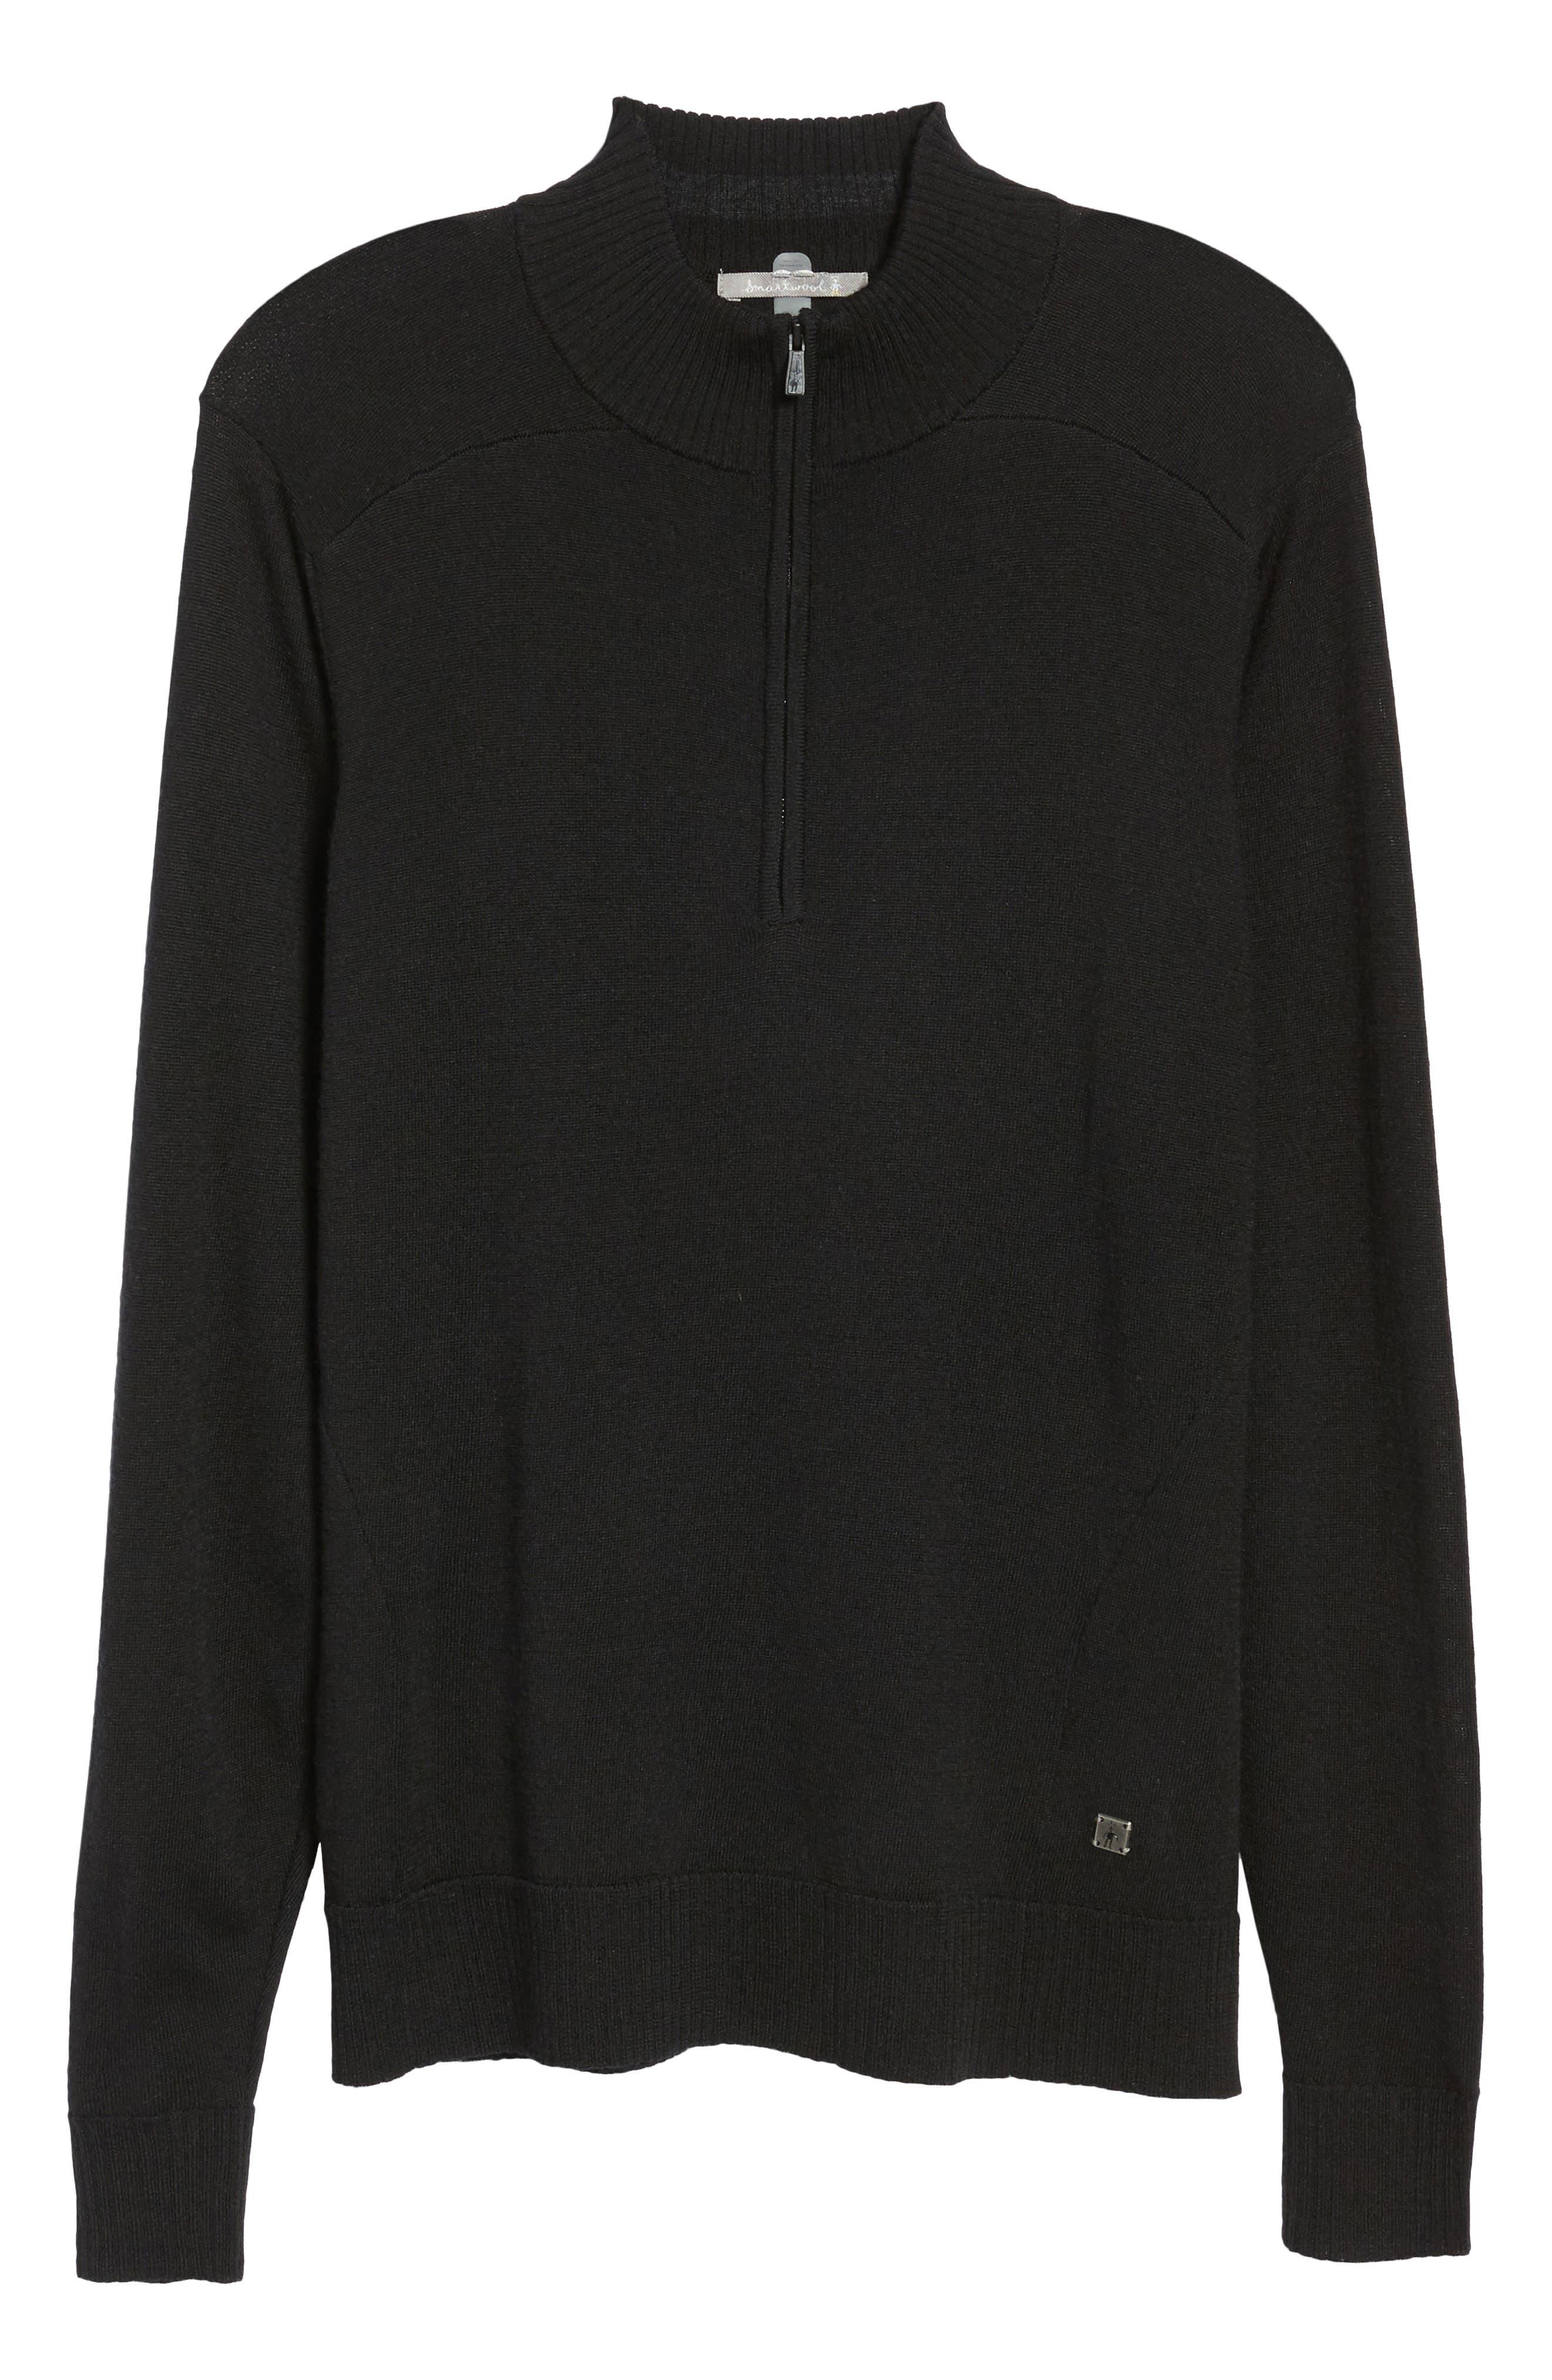 Kiva Ridge Merino Wool Blend Pullover,                             Alternate thumbnail 6, color,                             Black